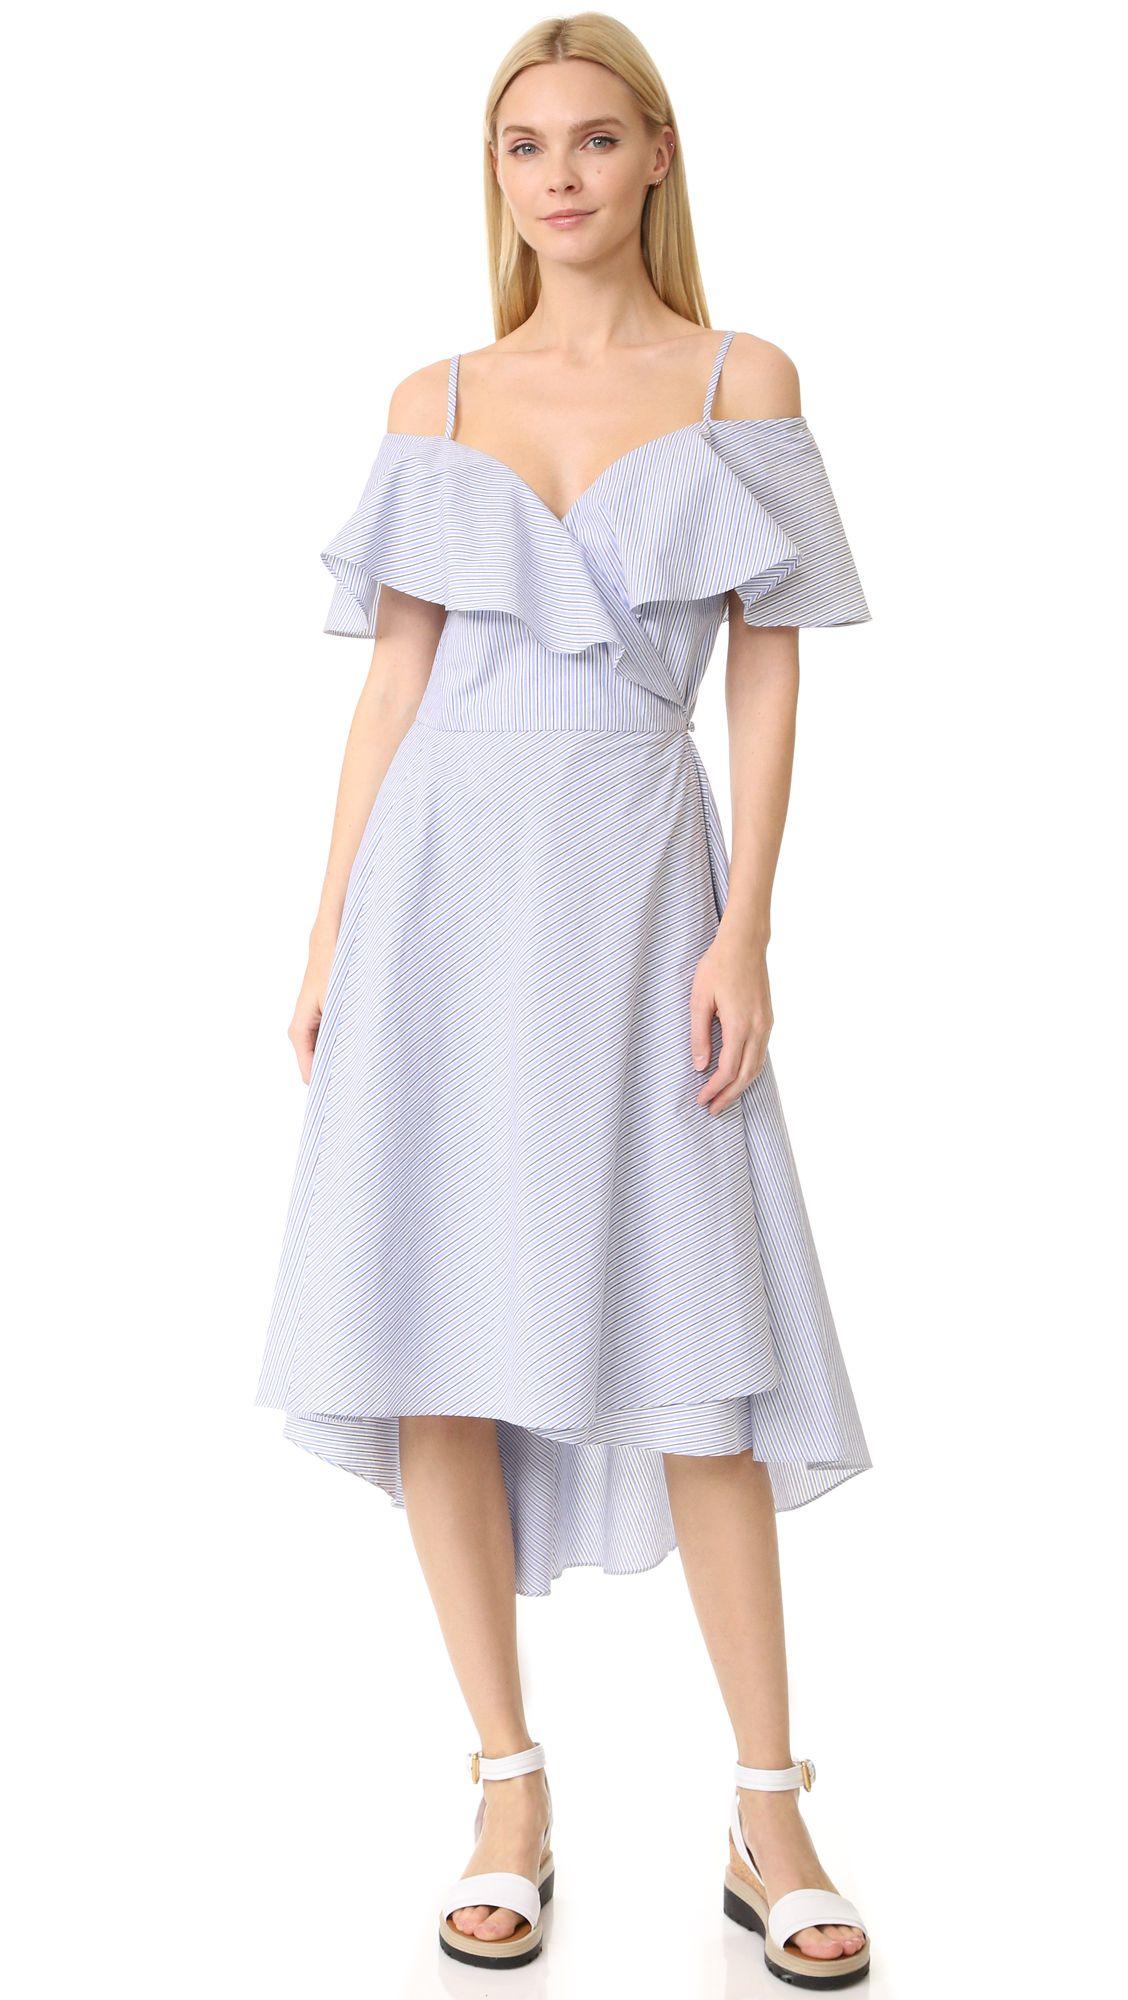 A striped off the shoulder dress